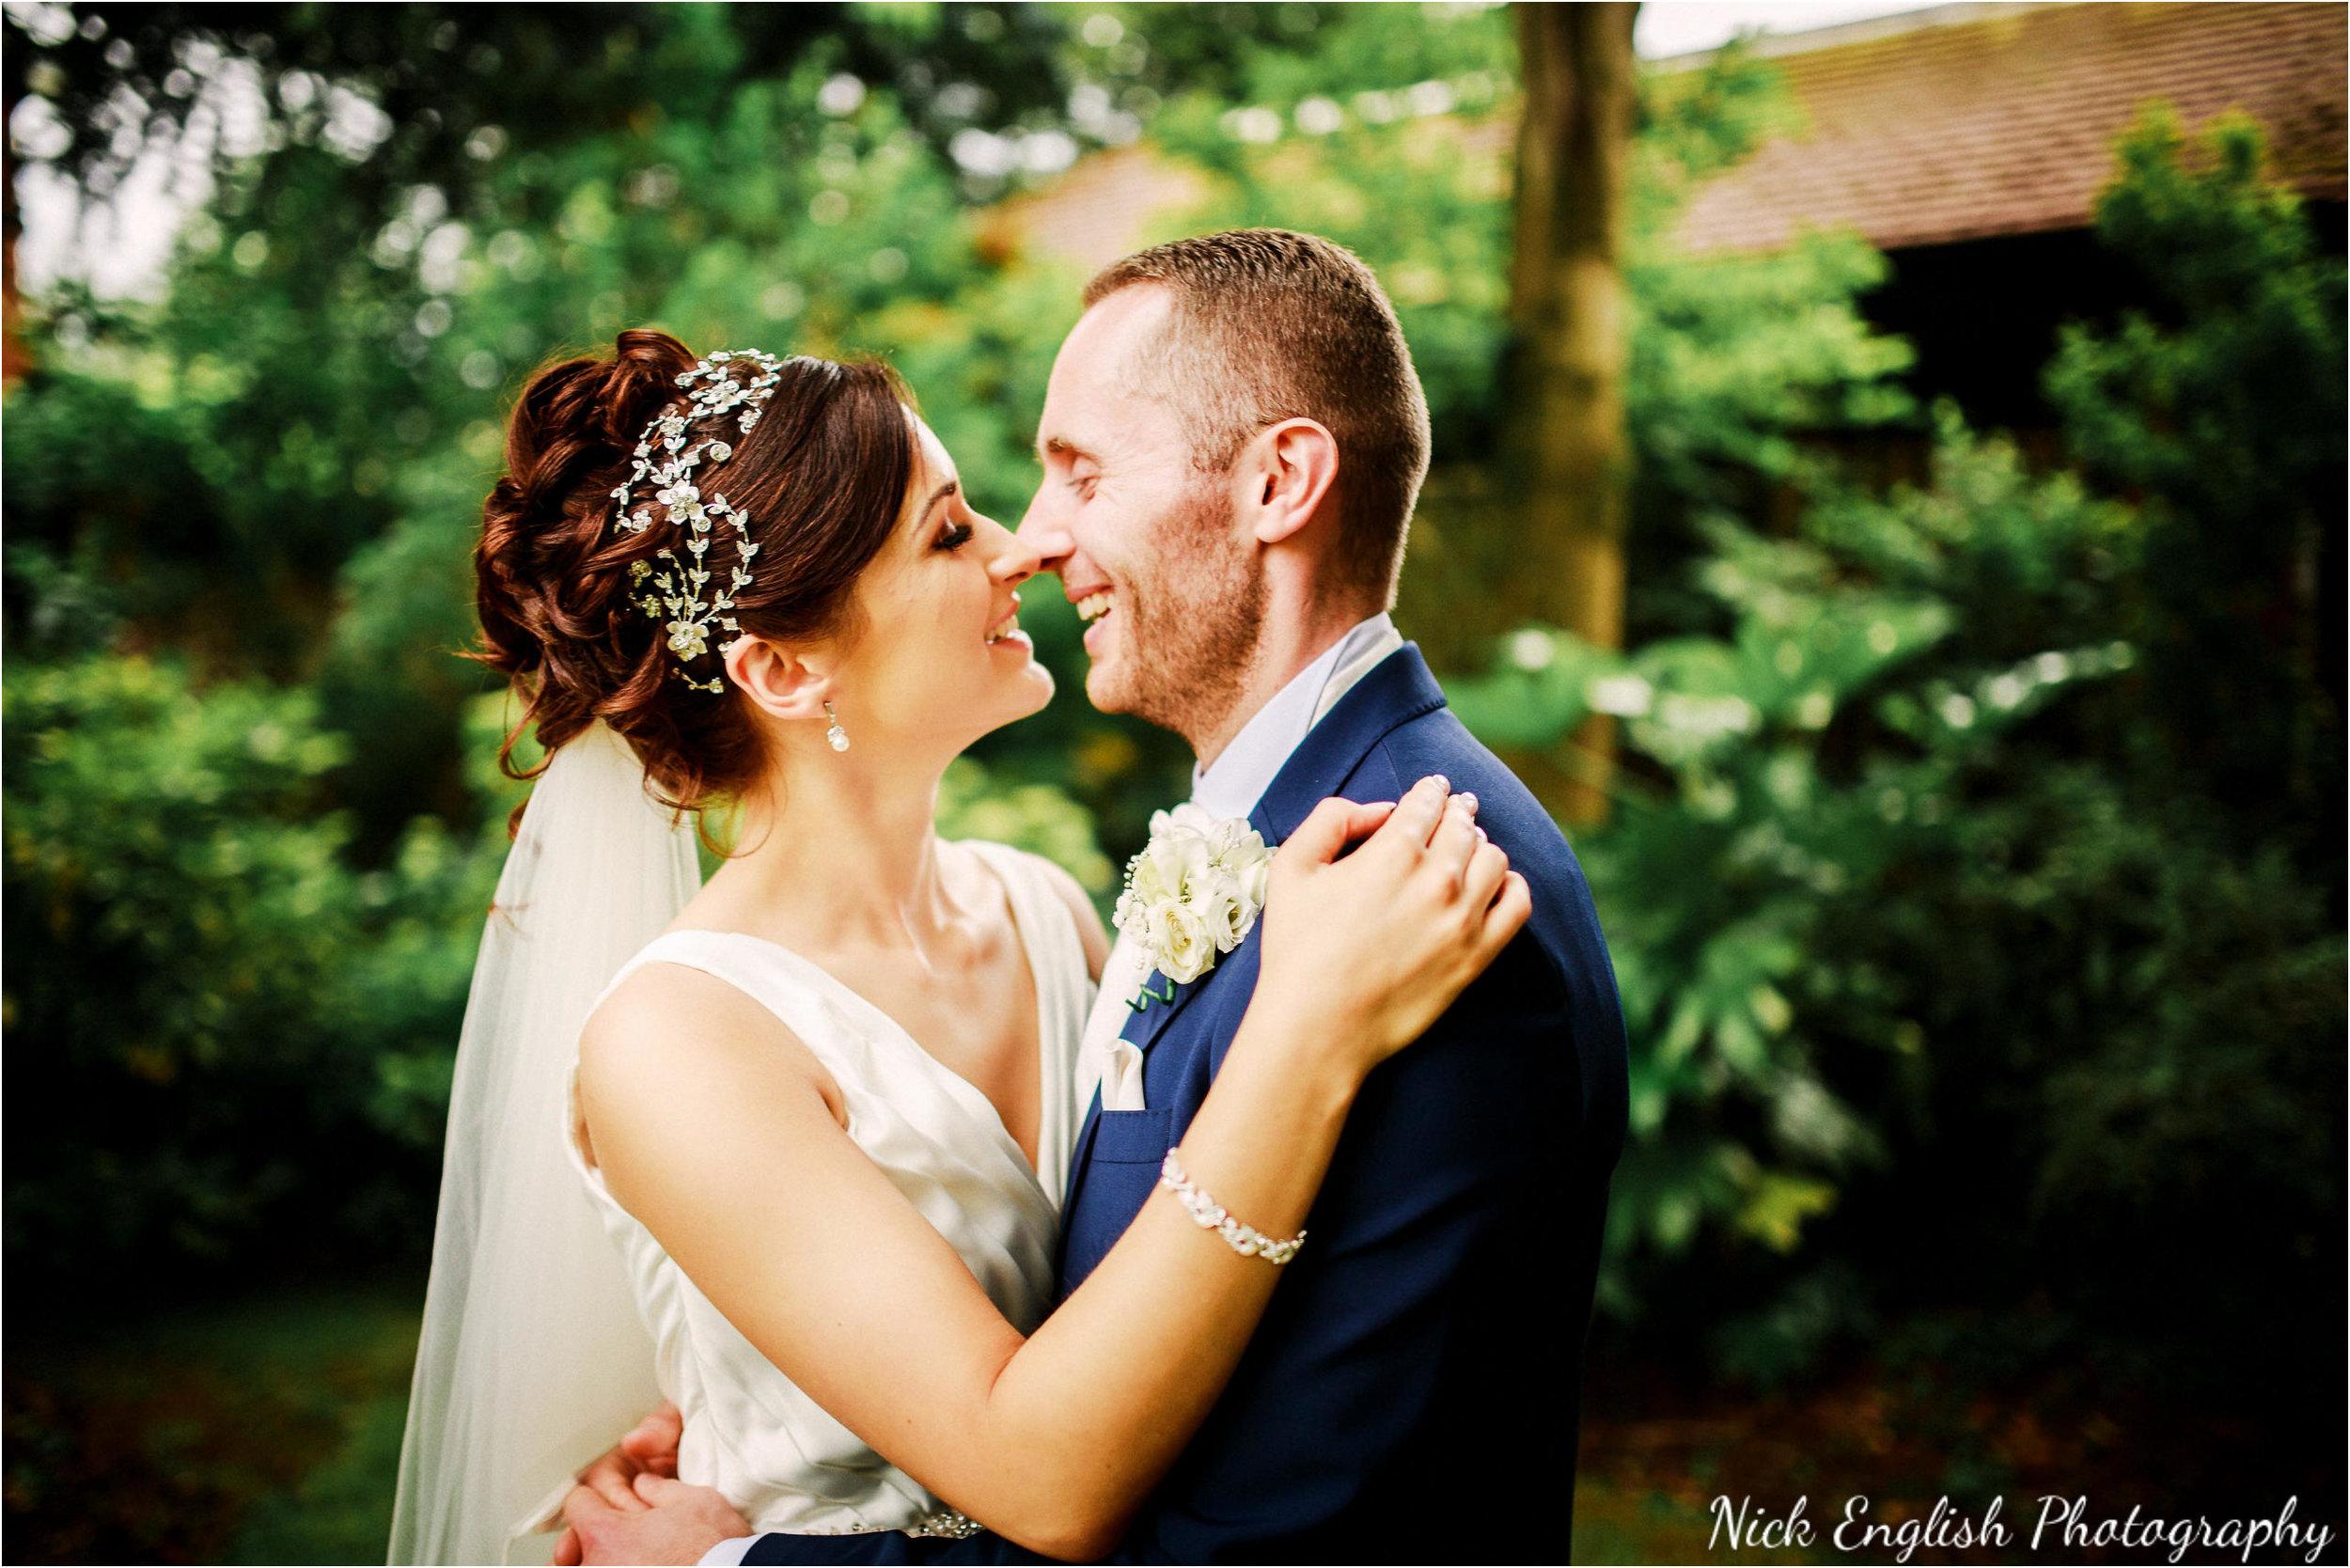 Emily David Wedding Photographs at Barton Grange Preston by Nick English Photography 120jpg.jpeg